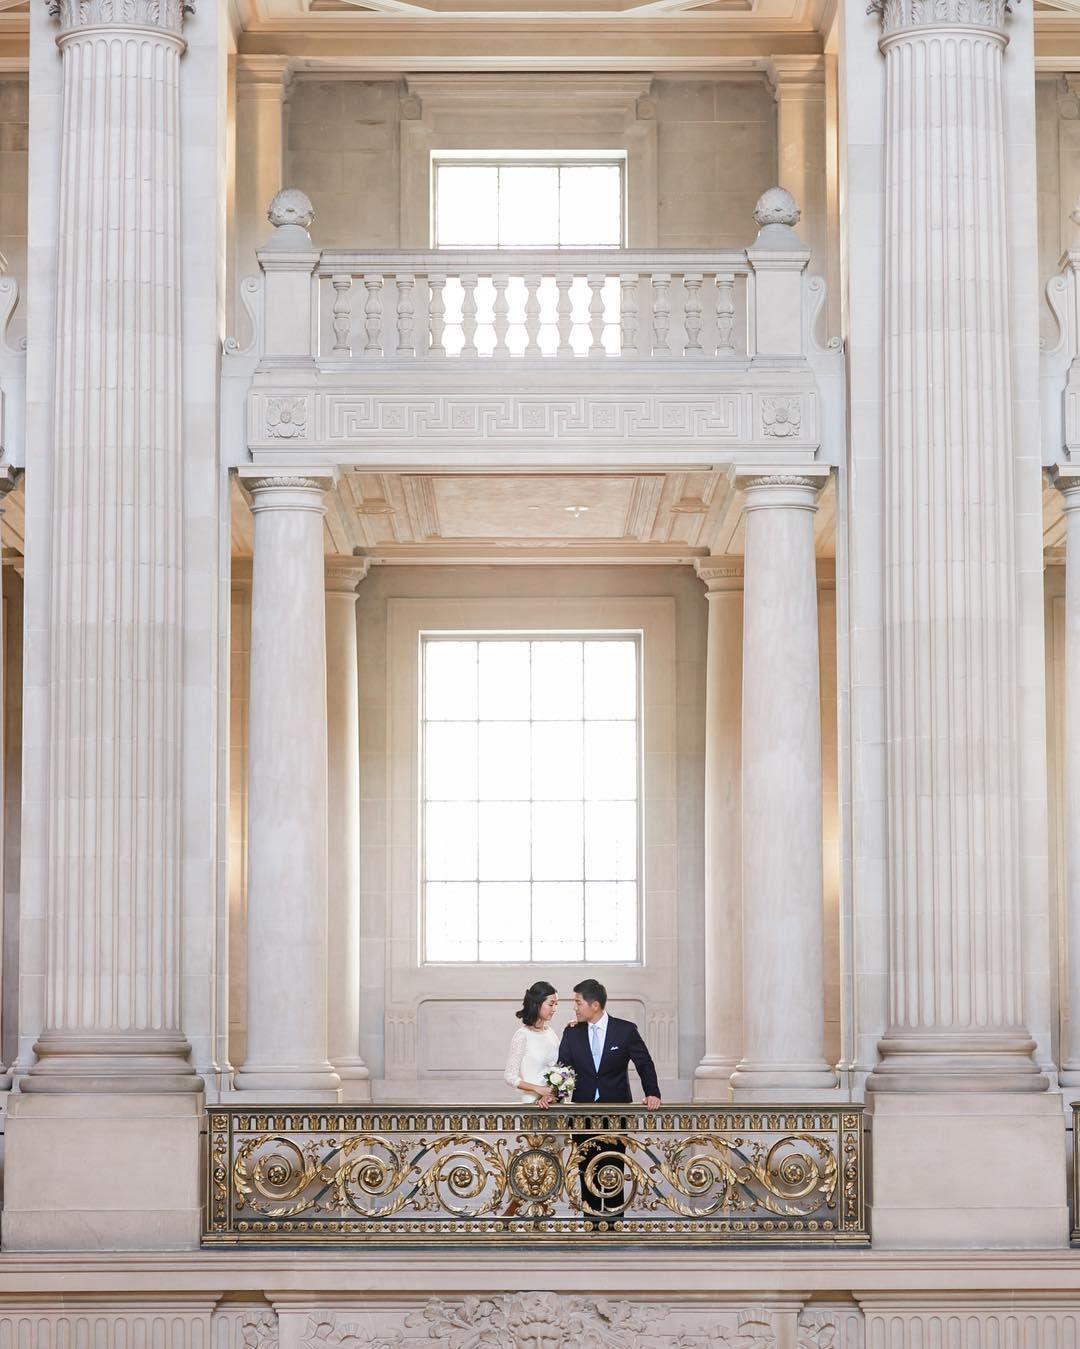 Civil Wedding Ideas: Pin By Zuband 空间与环境🏚 On 婚礼秀